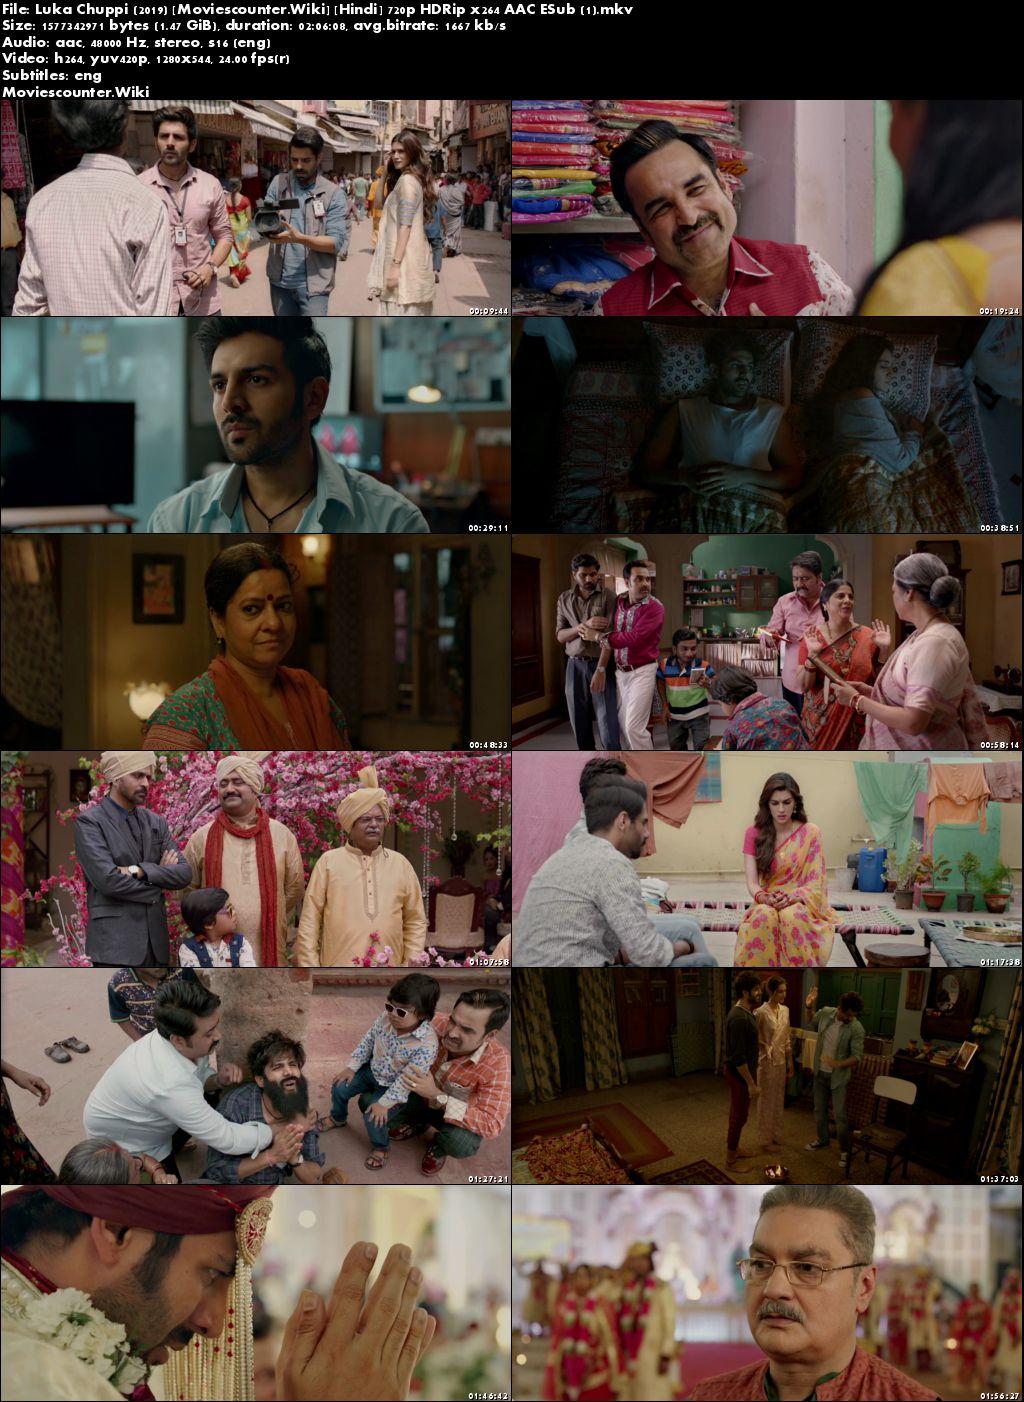 Screen Shots Luka Chuppi 2019 Hindi HD 720p